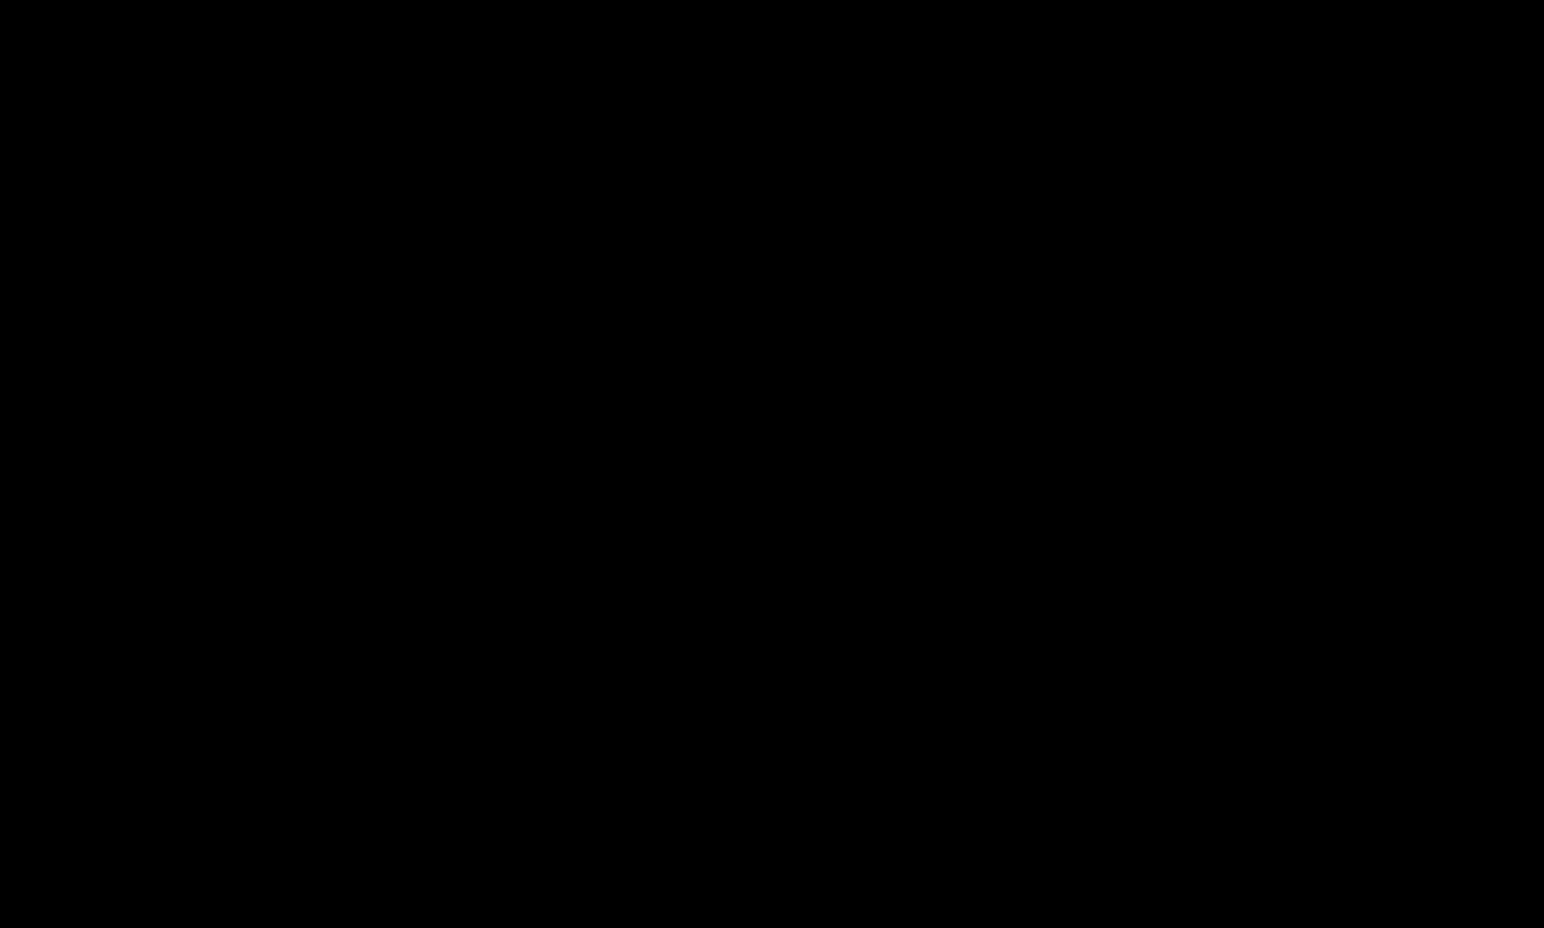 4-(NHS ester)-3-fluorobenzeneboronic acid pinacol ester